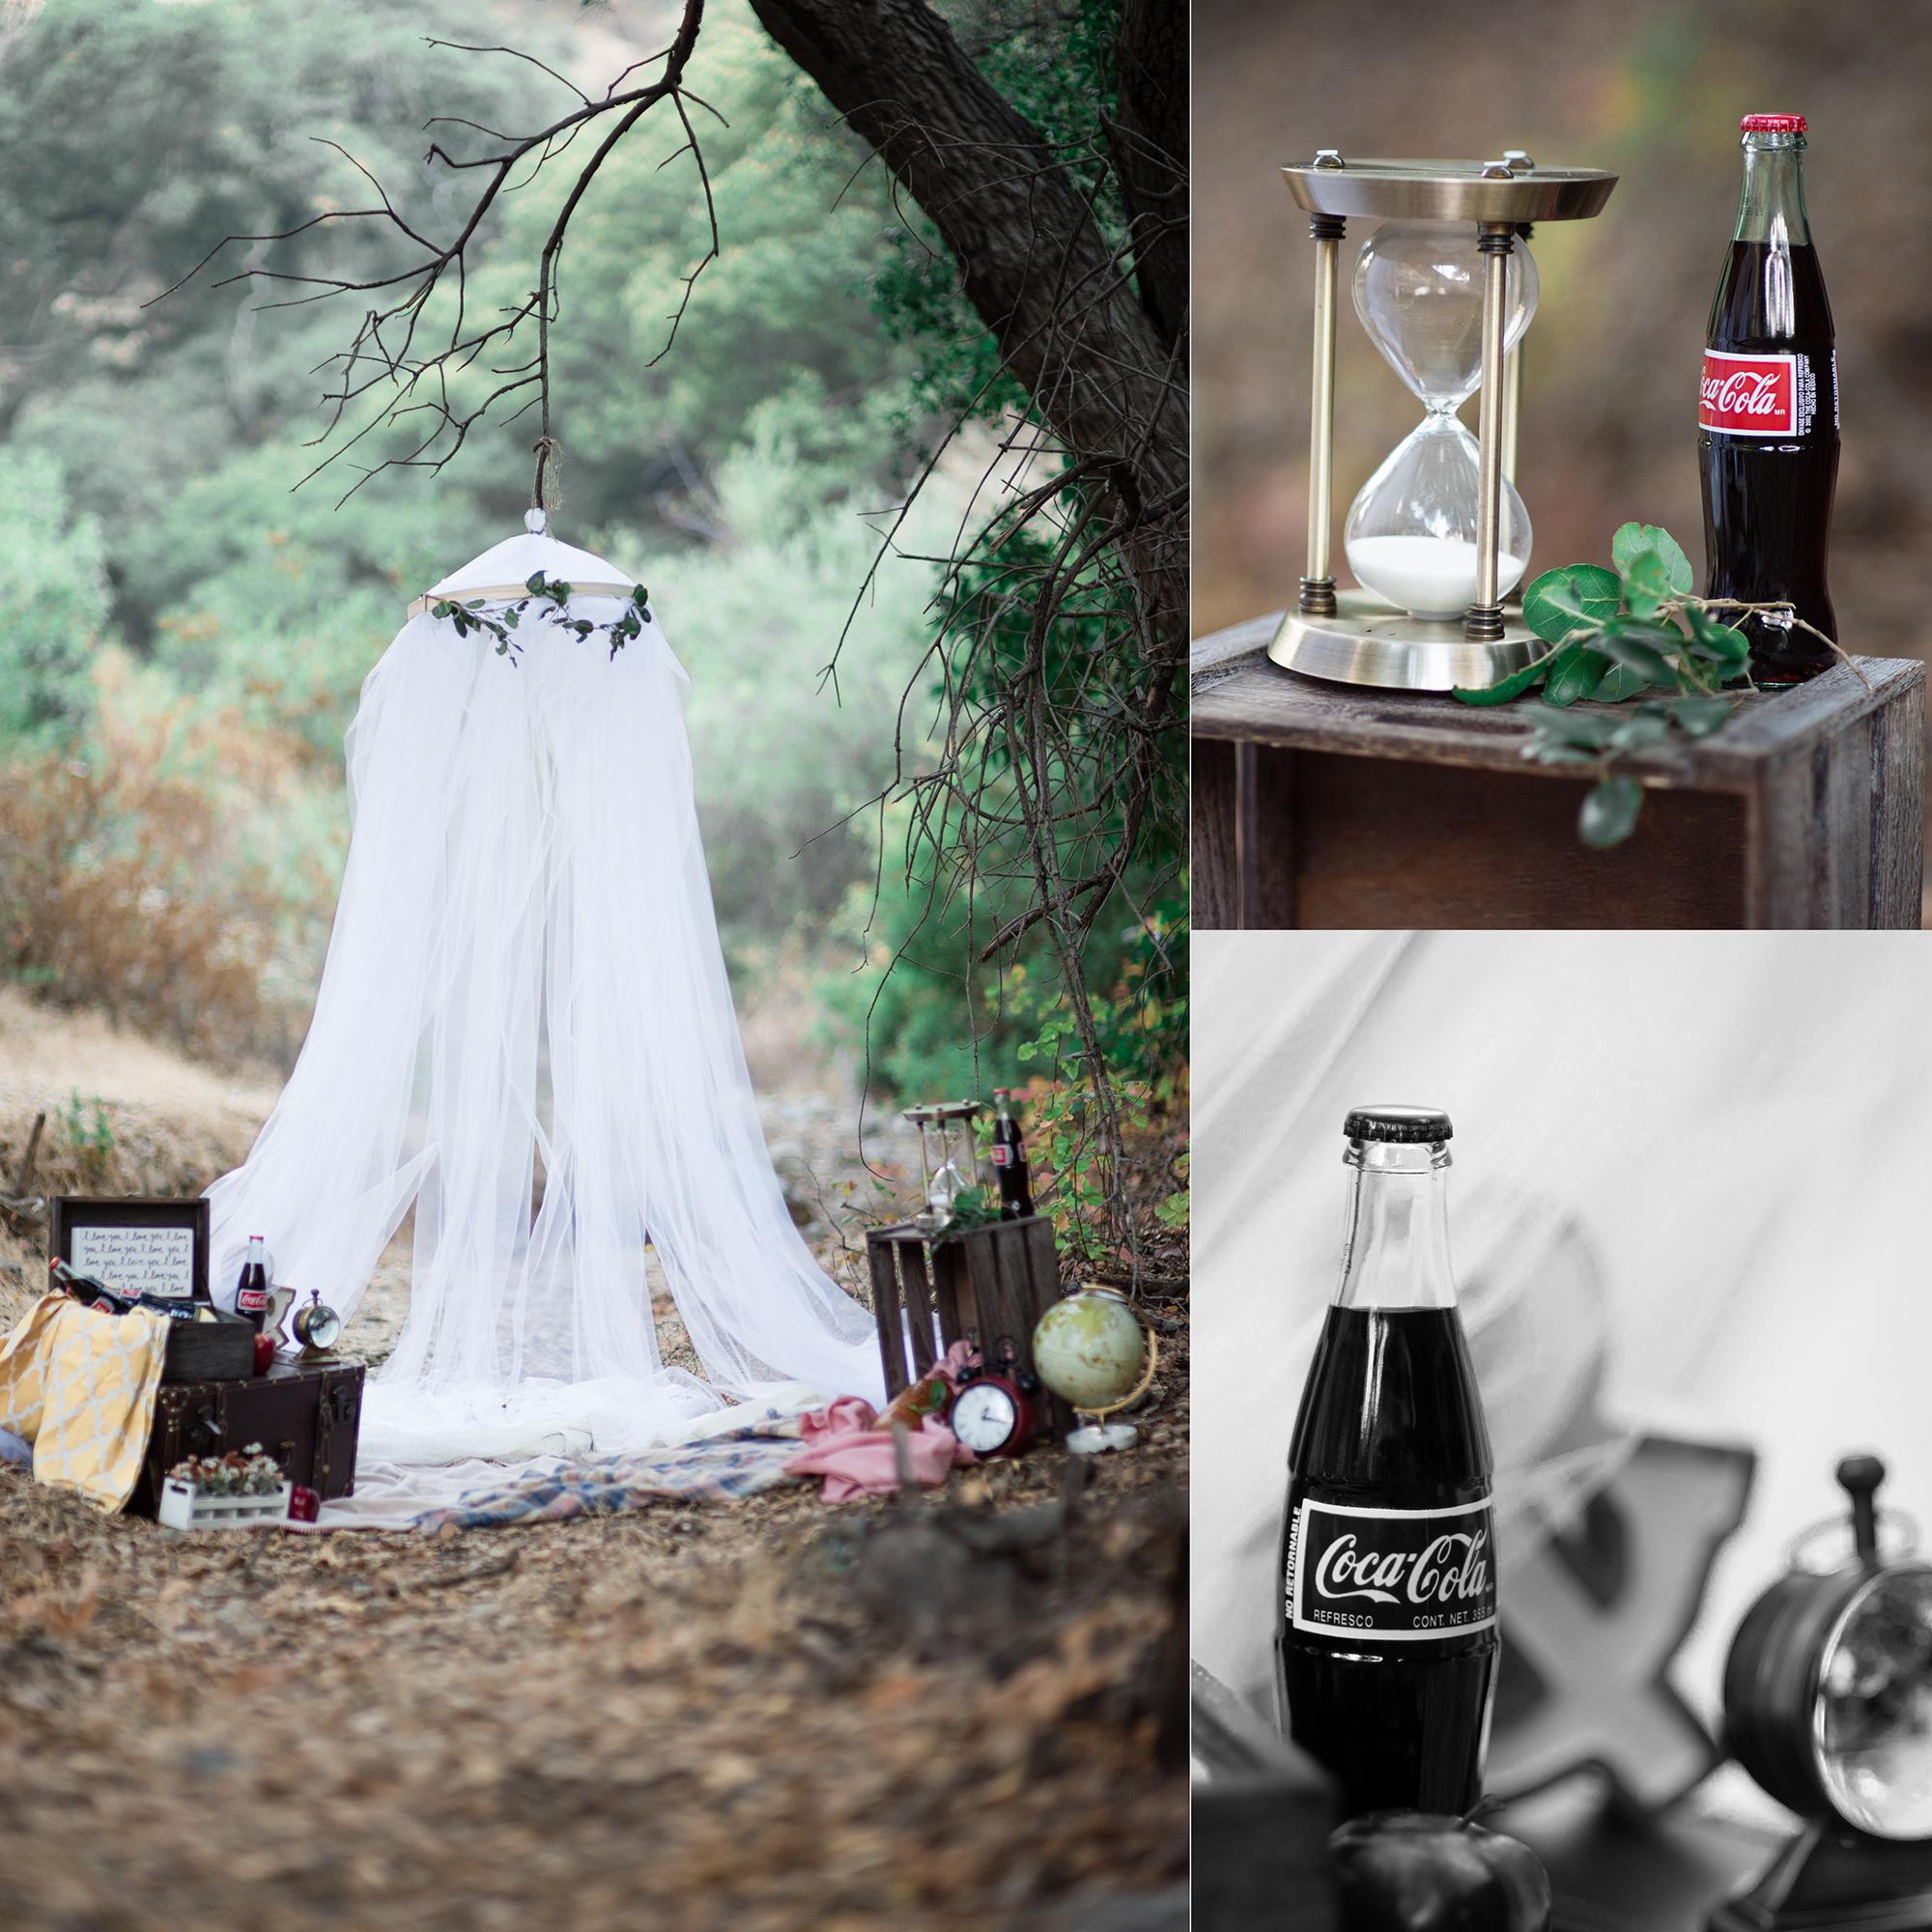 Retro, Vintage Picnic Engagement Photoshoot